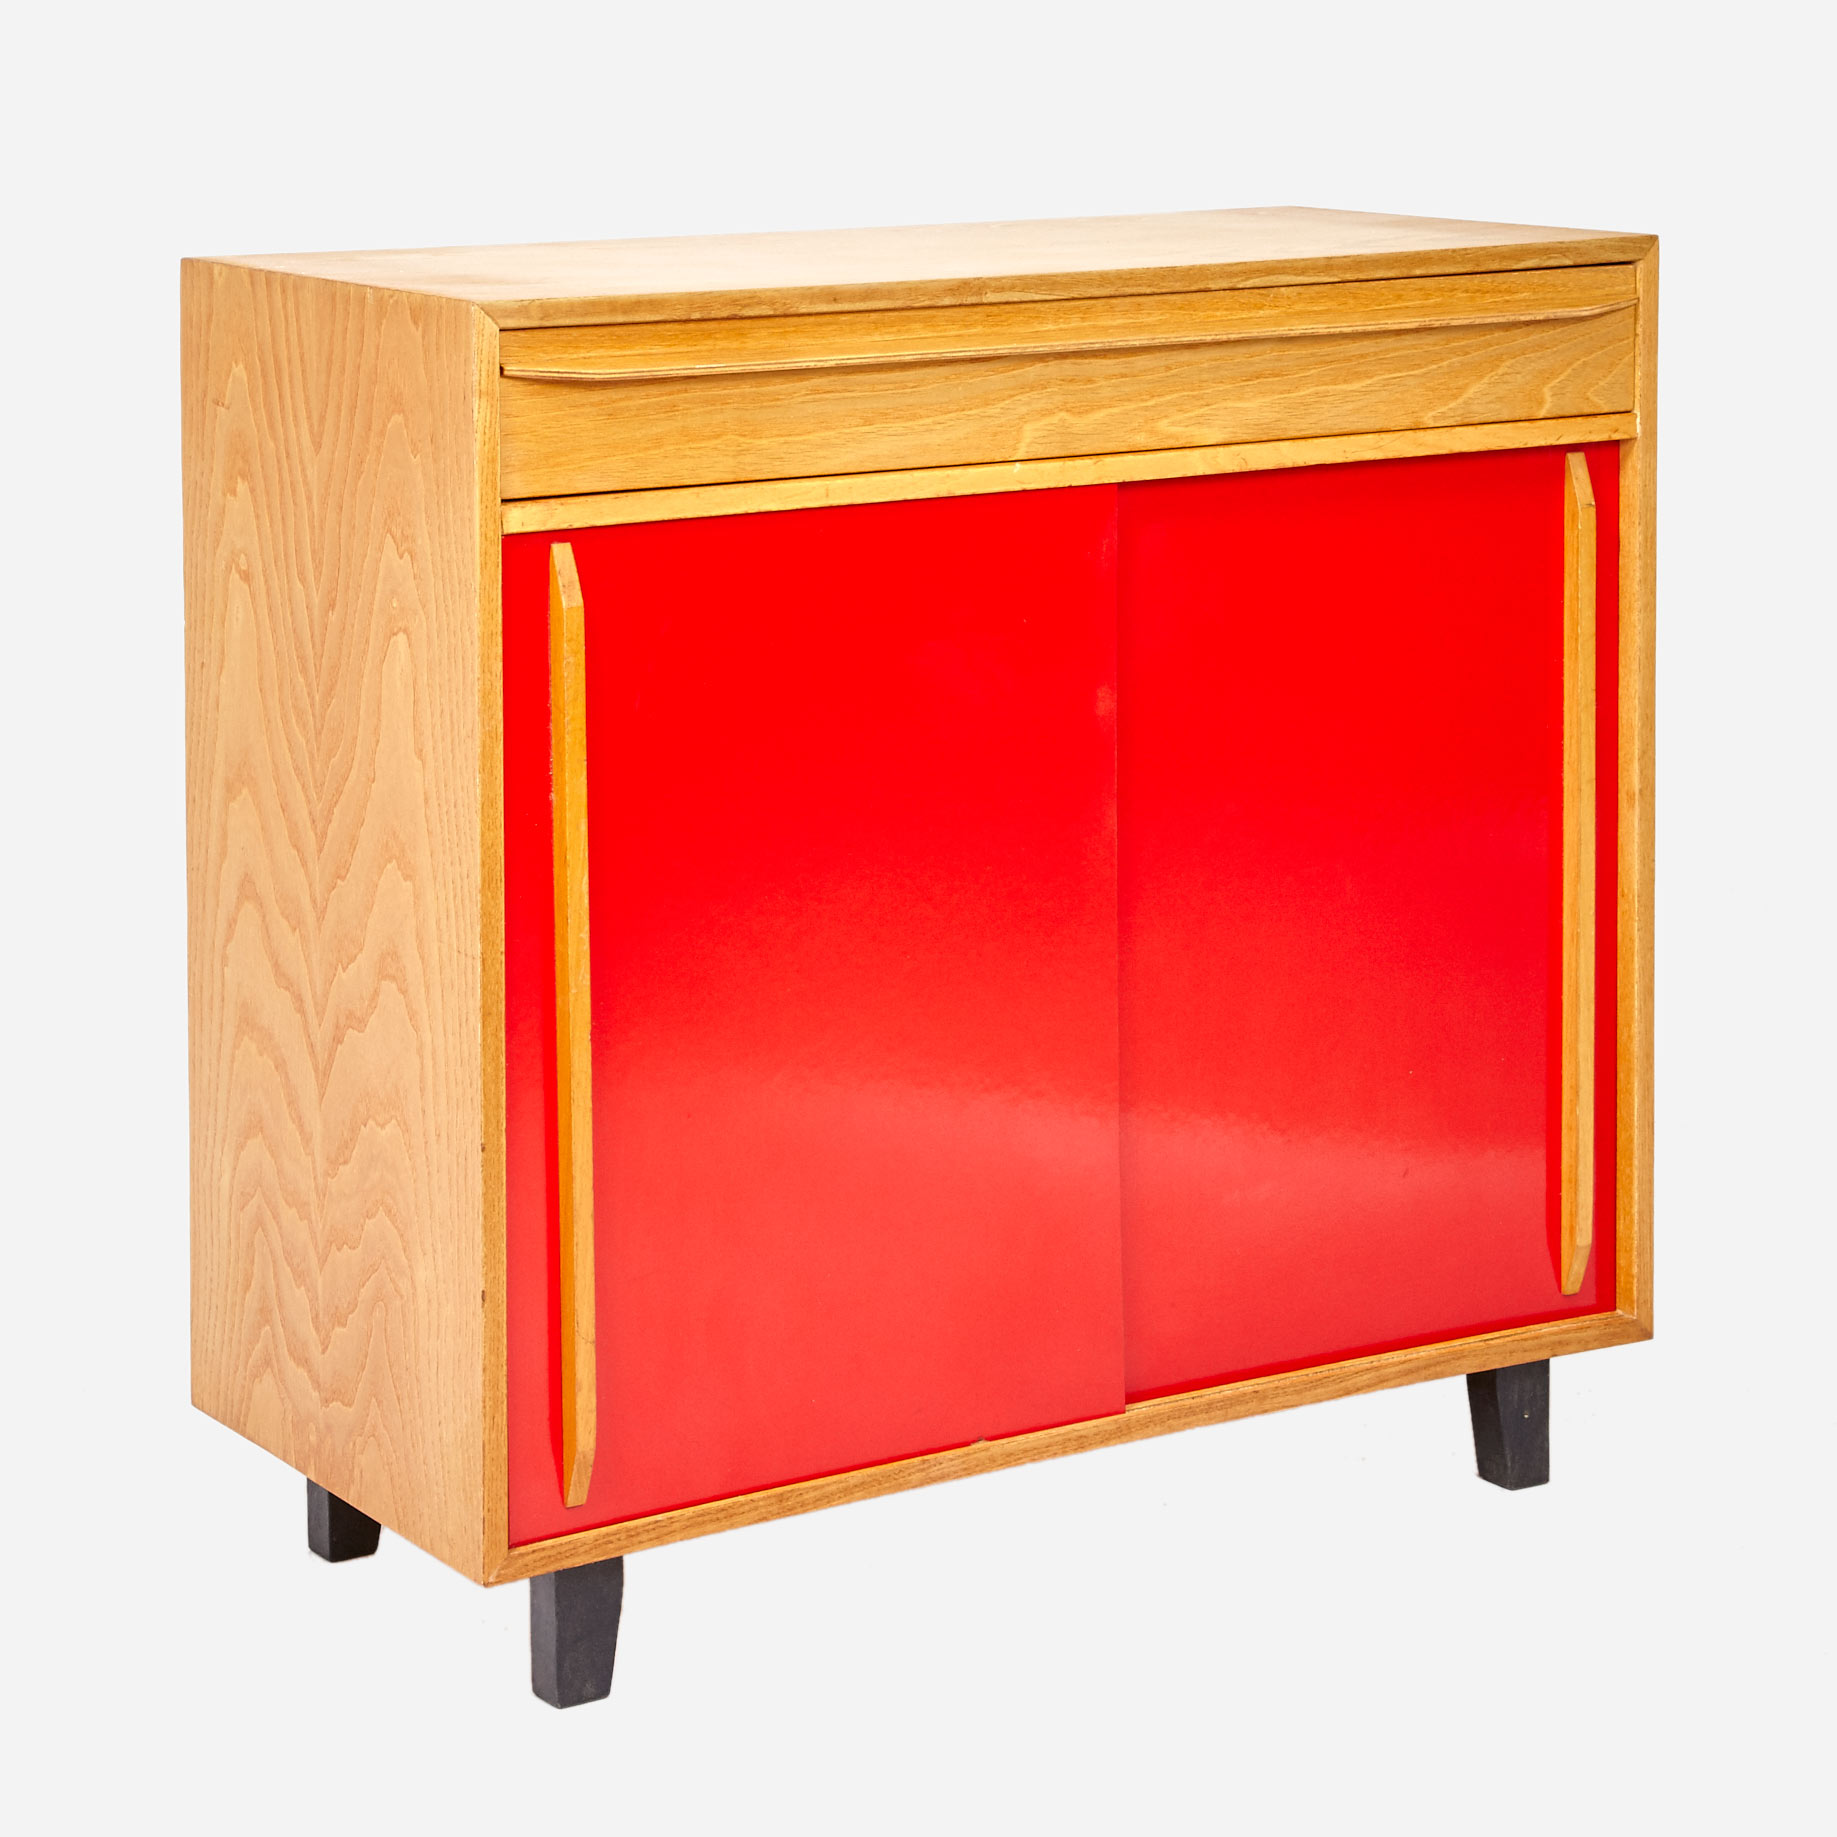 schiebeschrank aus eschenholz restauriert m bel z rich vintagem bel. Black Bedroom Furniture Sets. Home Design Ideas